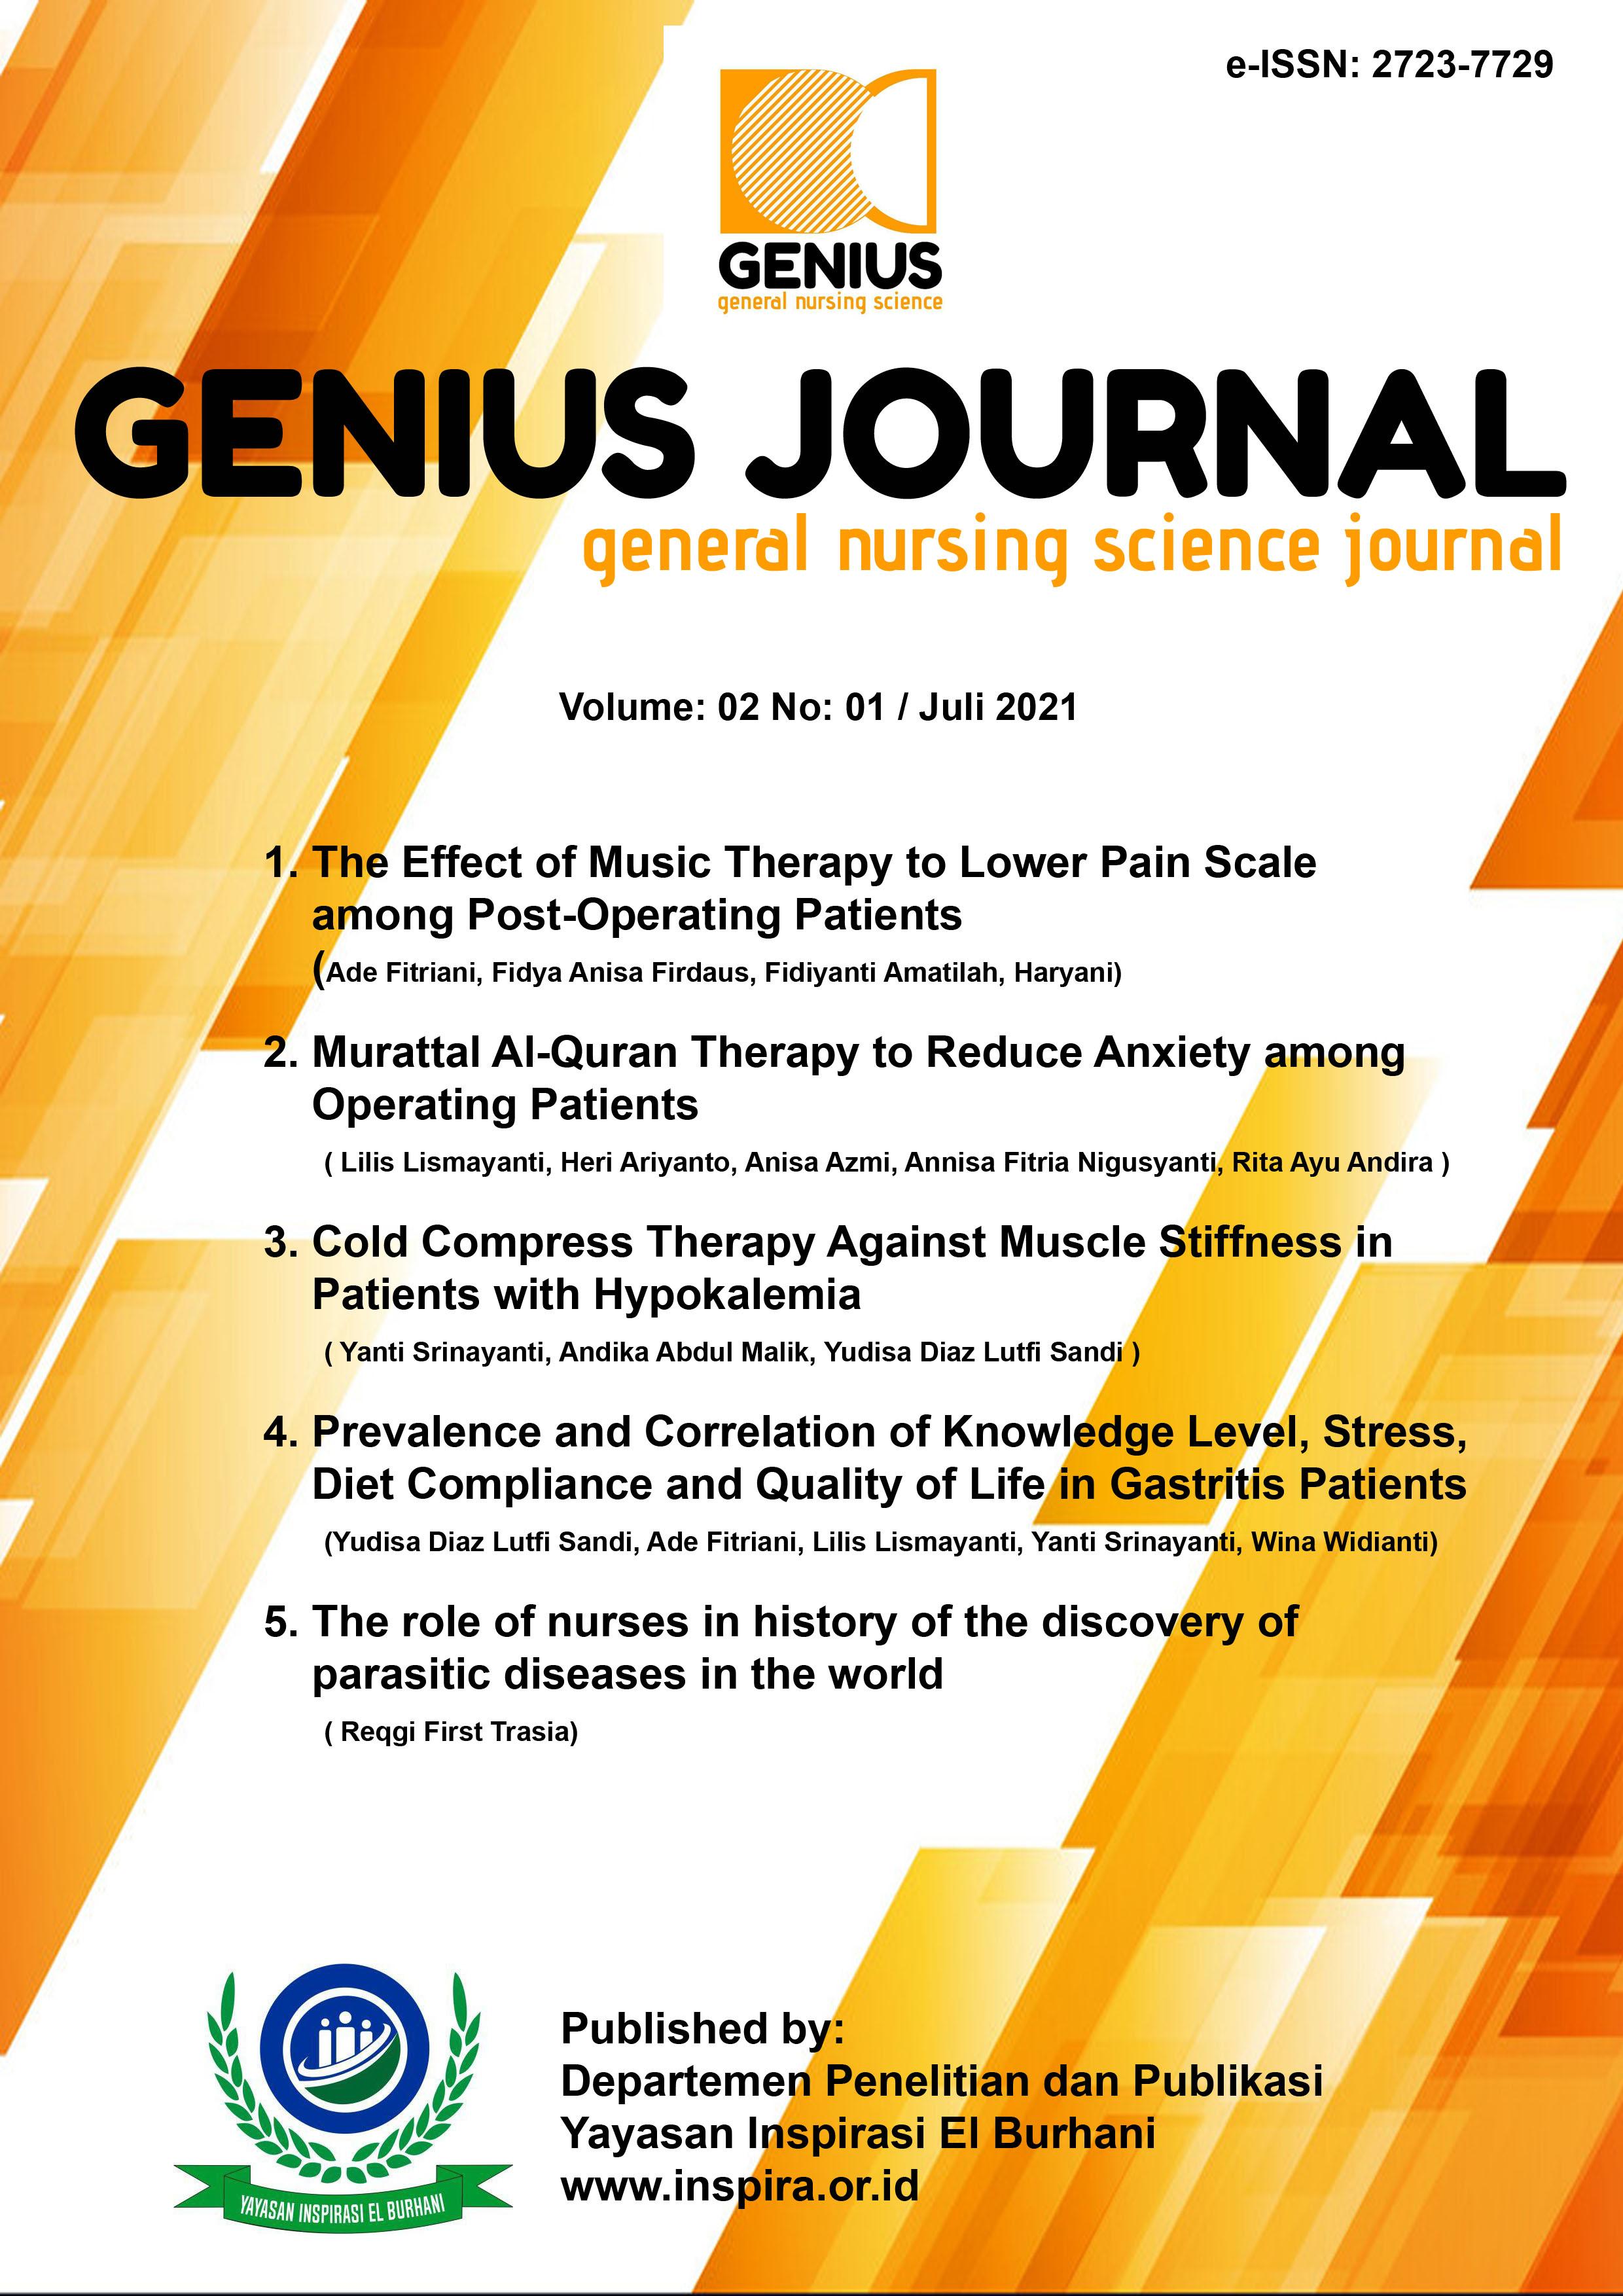 View Vol. 2 No. 1 (2021): GENIUS JOURNAL